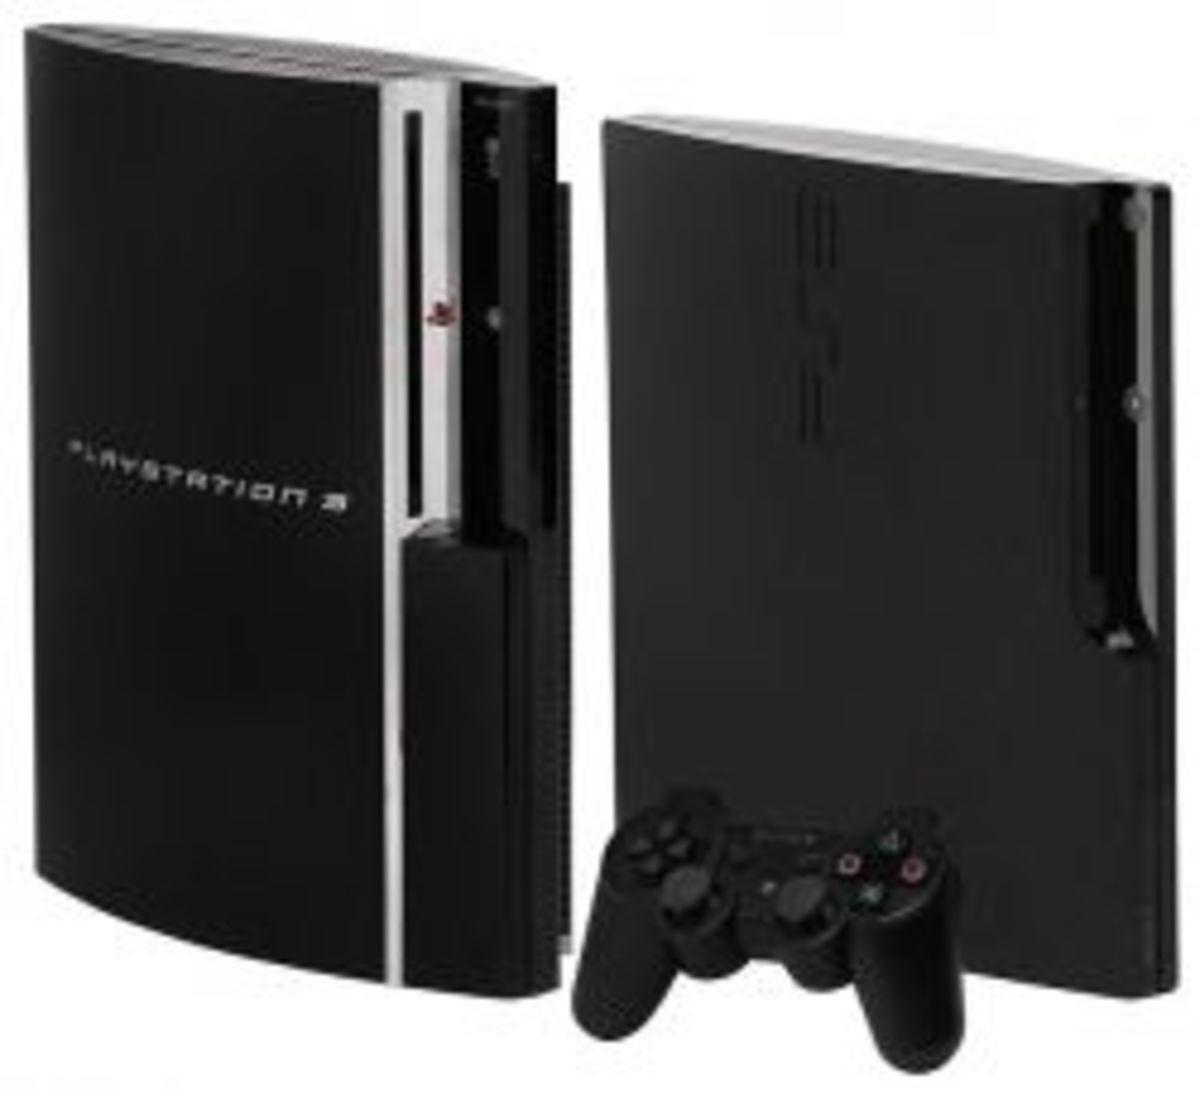 Best External Hard Drives For PS3